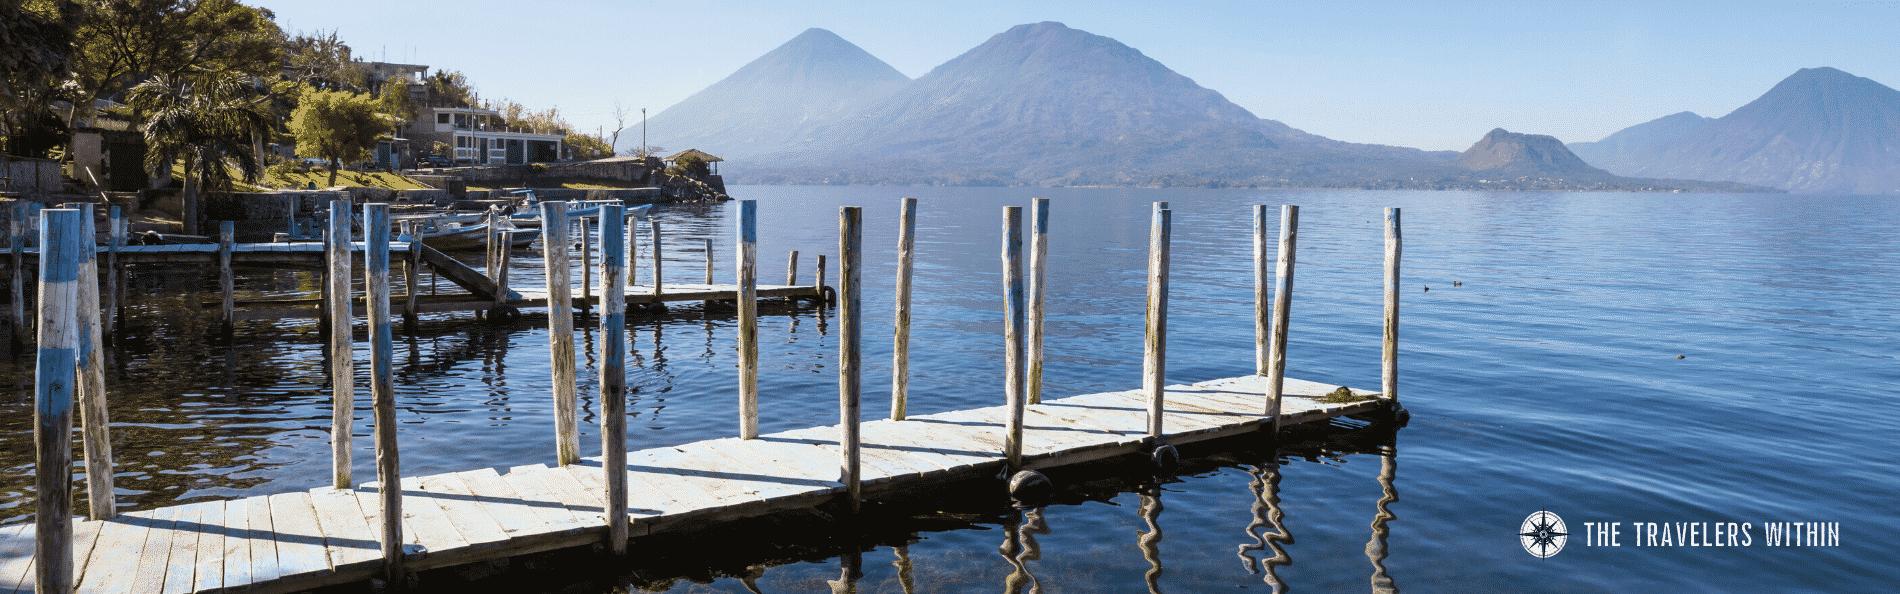 Lake Atitlan Guatemala - Lago De Atitlan Guatemala